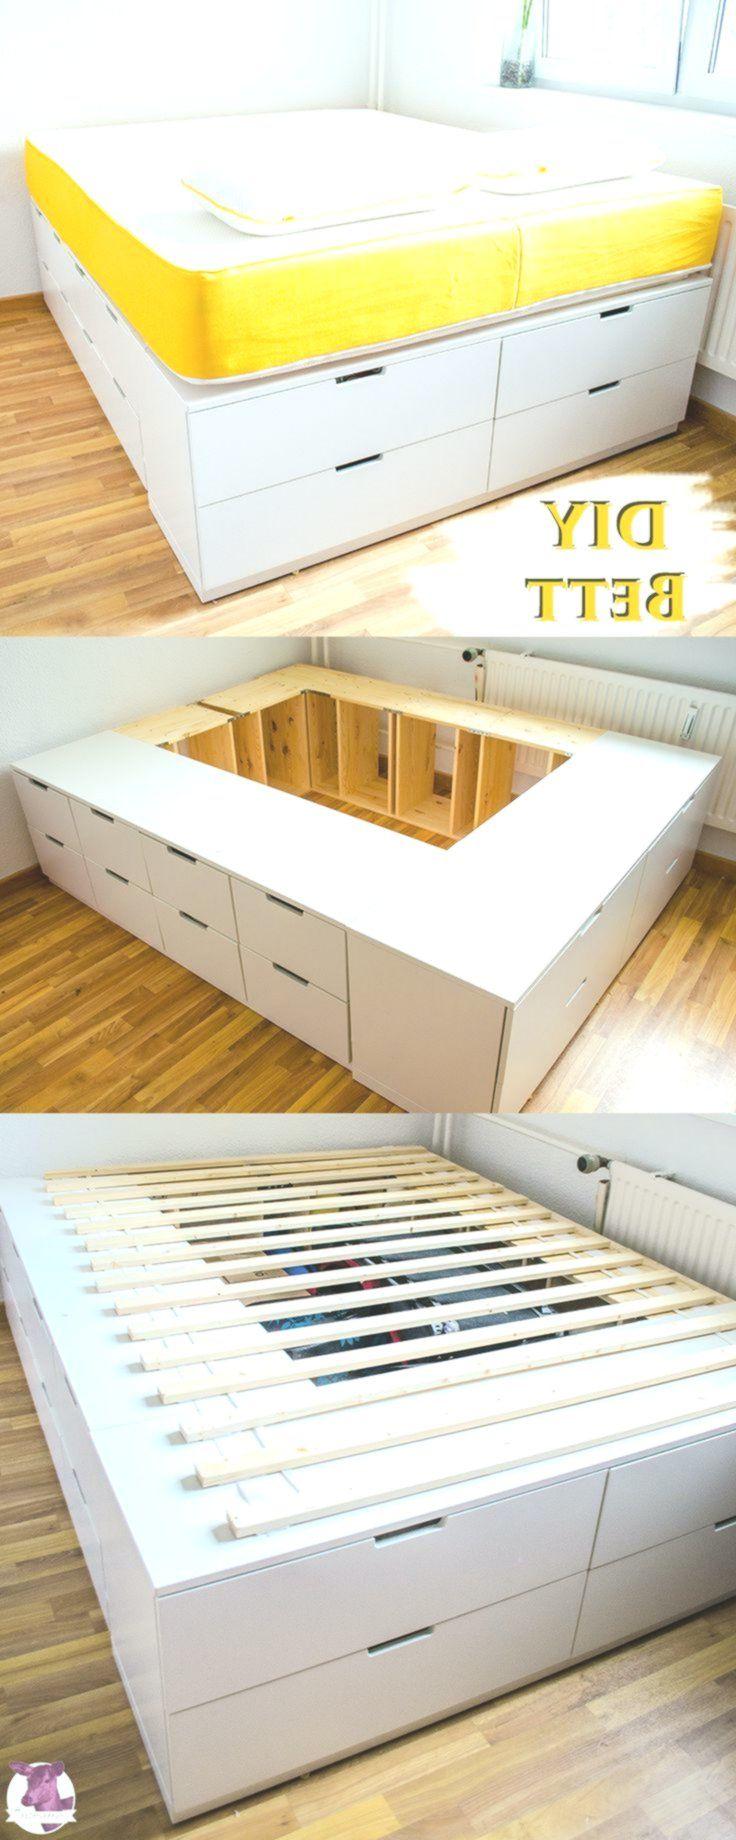 Diy Ikea Hack Stabiles Sehr Hohes Bett Mit Viel Stauraum Zum Selberbauen Diyydeko Club Ikea Diy Diy Ikea Hacks Diy Furniture Bedroom